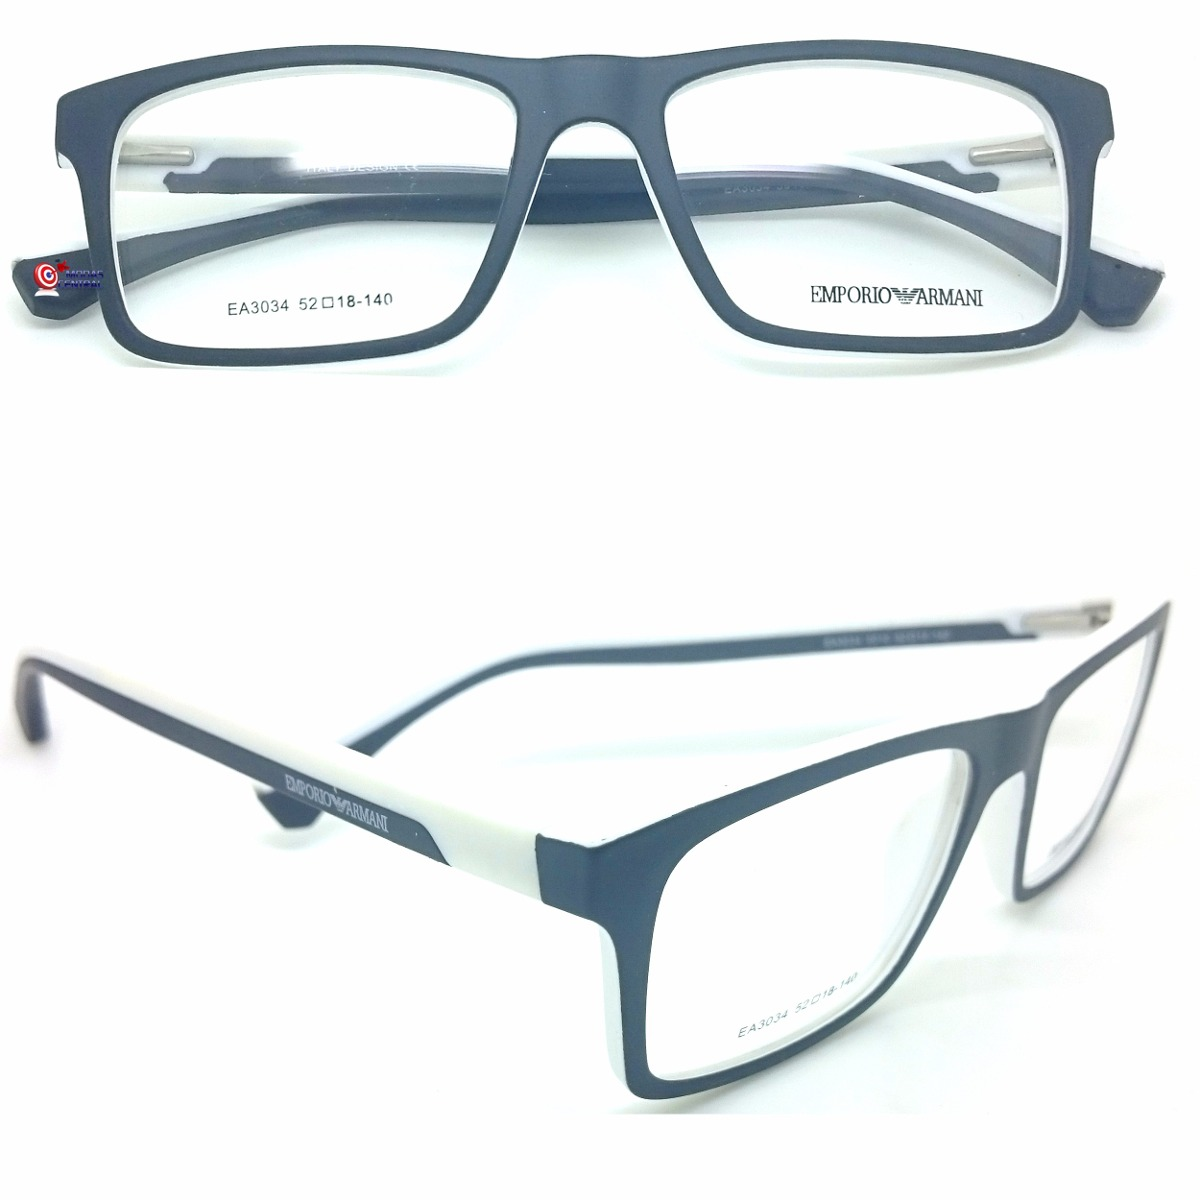 0d1802c59 Armação Armani P/ Óculos De Grau Masculina Feminina Cores - R$ 106 ...